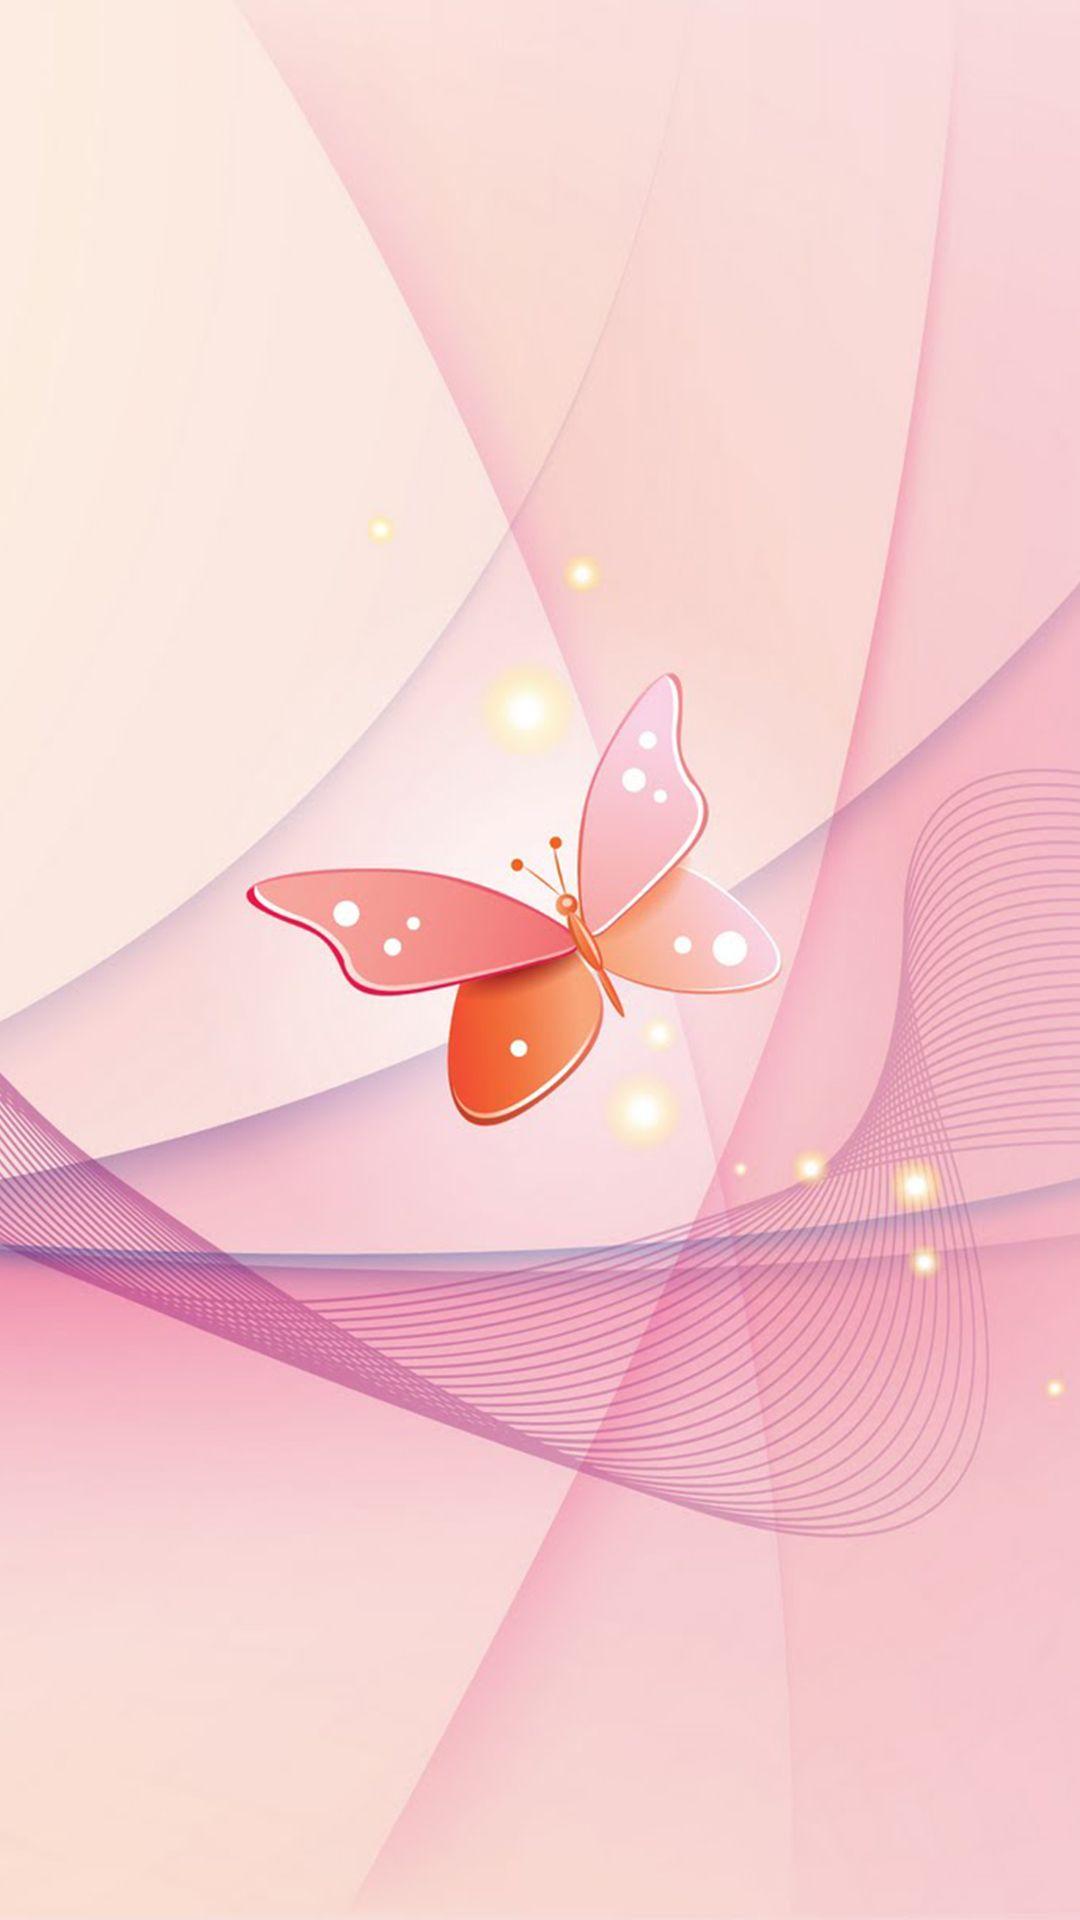 Pink Butterfly Iphone Wallpaper Butterfly Wallpaper Iphone Pink Wallpaper Iphone Love Pink Wallpaper